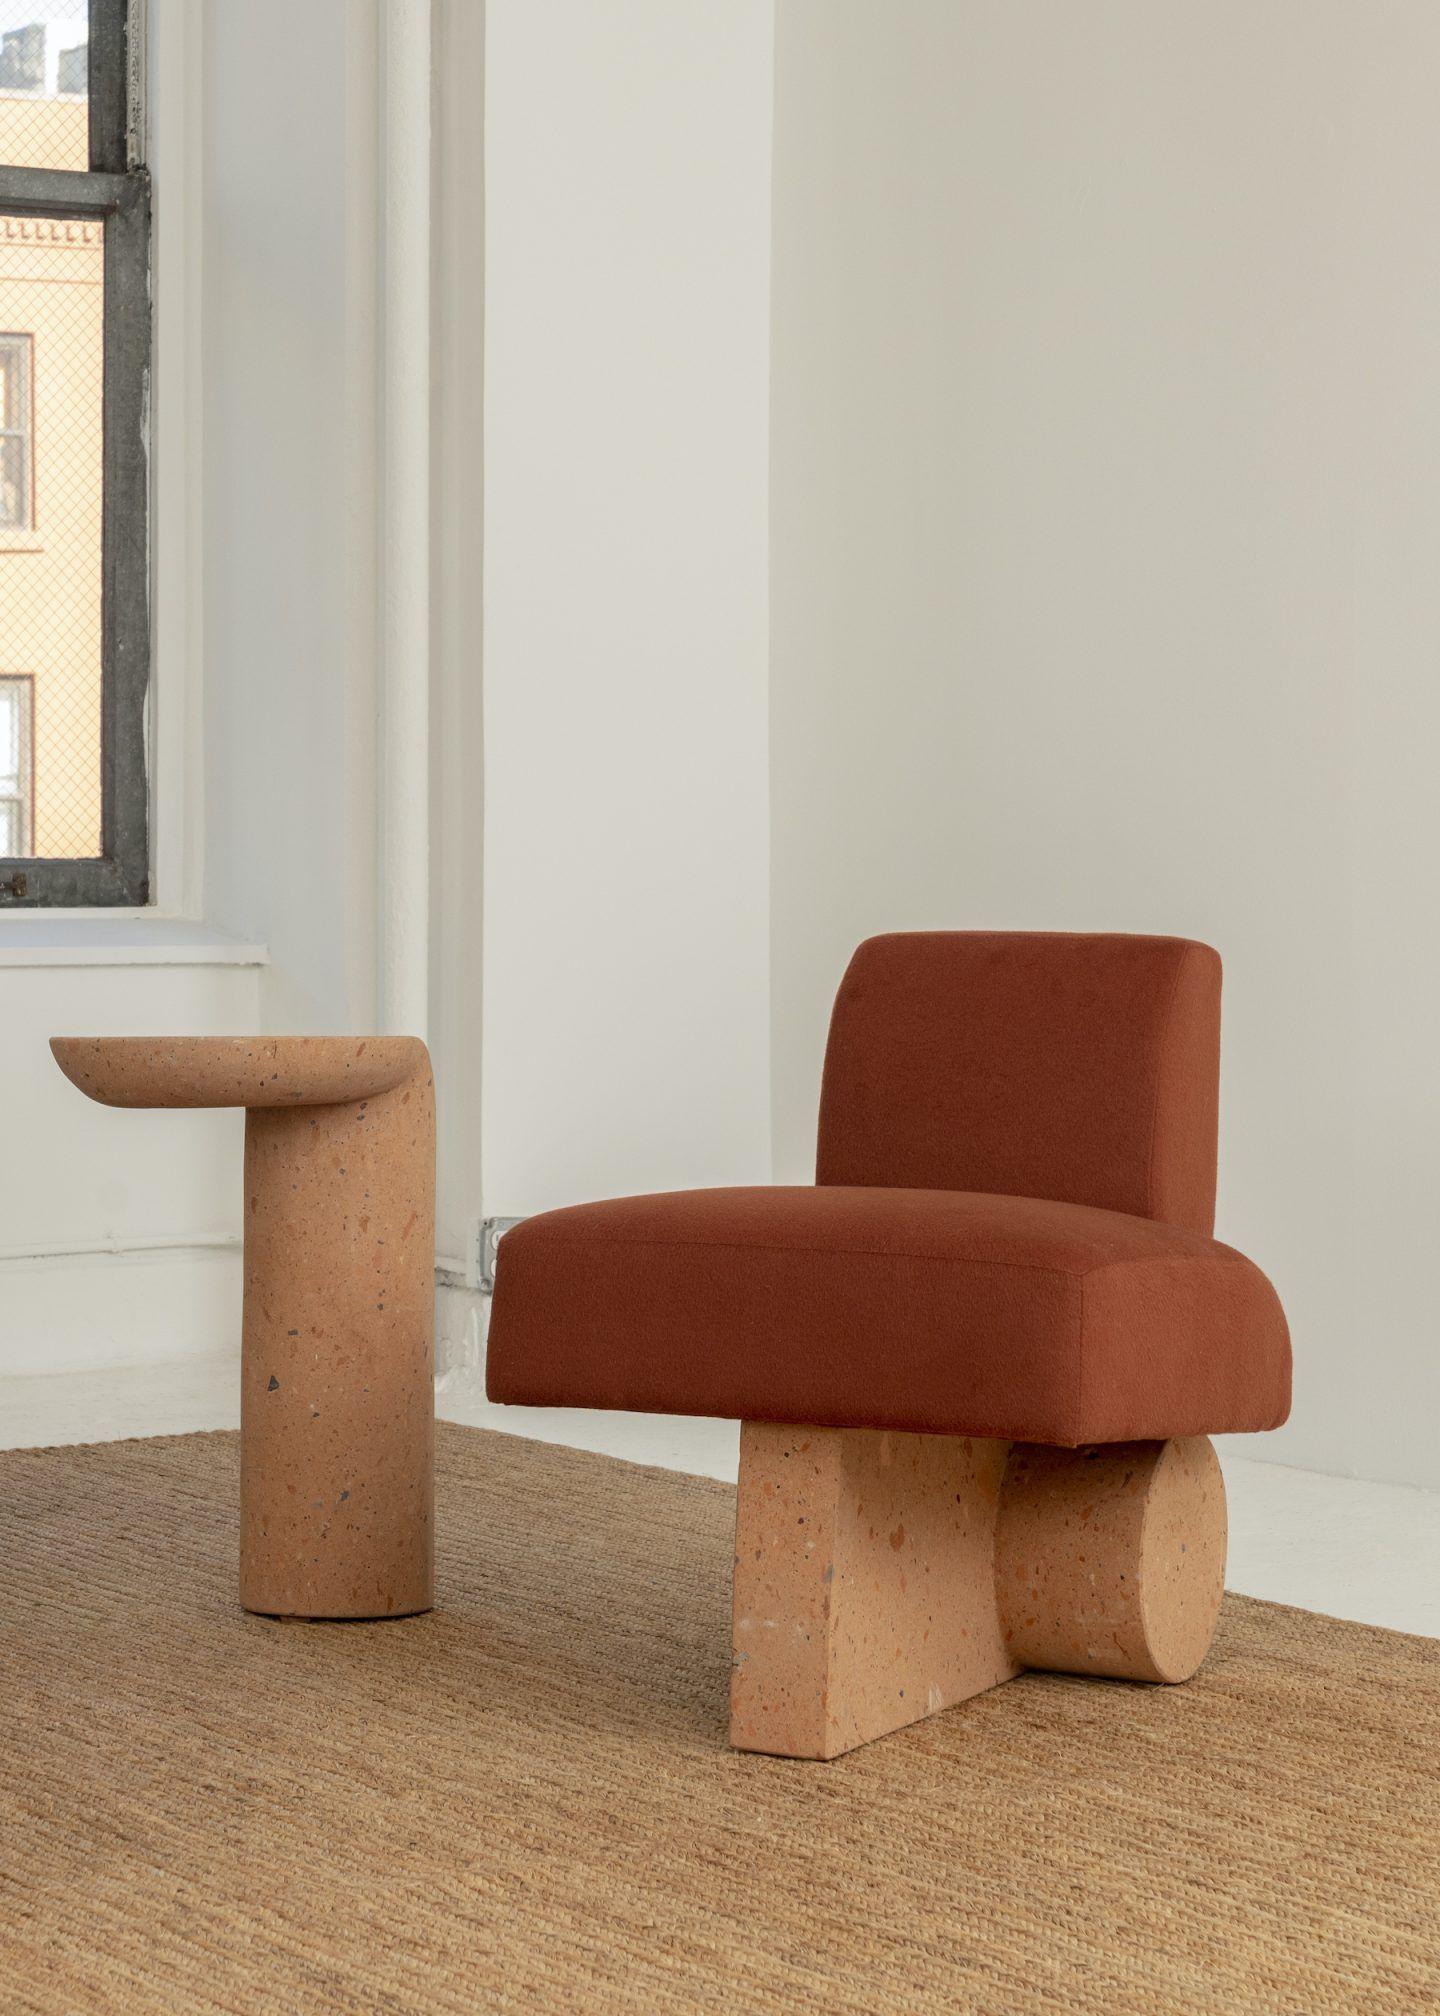 IGNANT-Design-Ian-Felton-Kosa-4